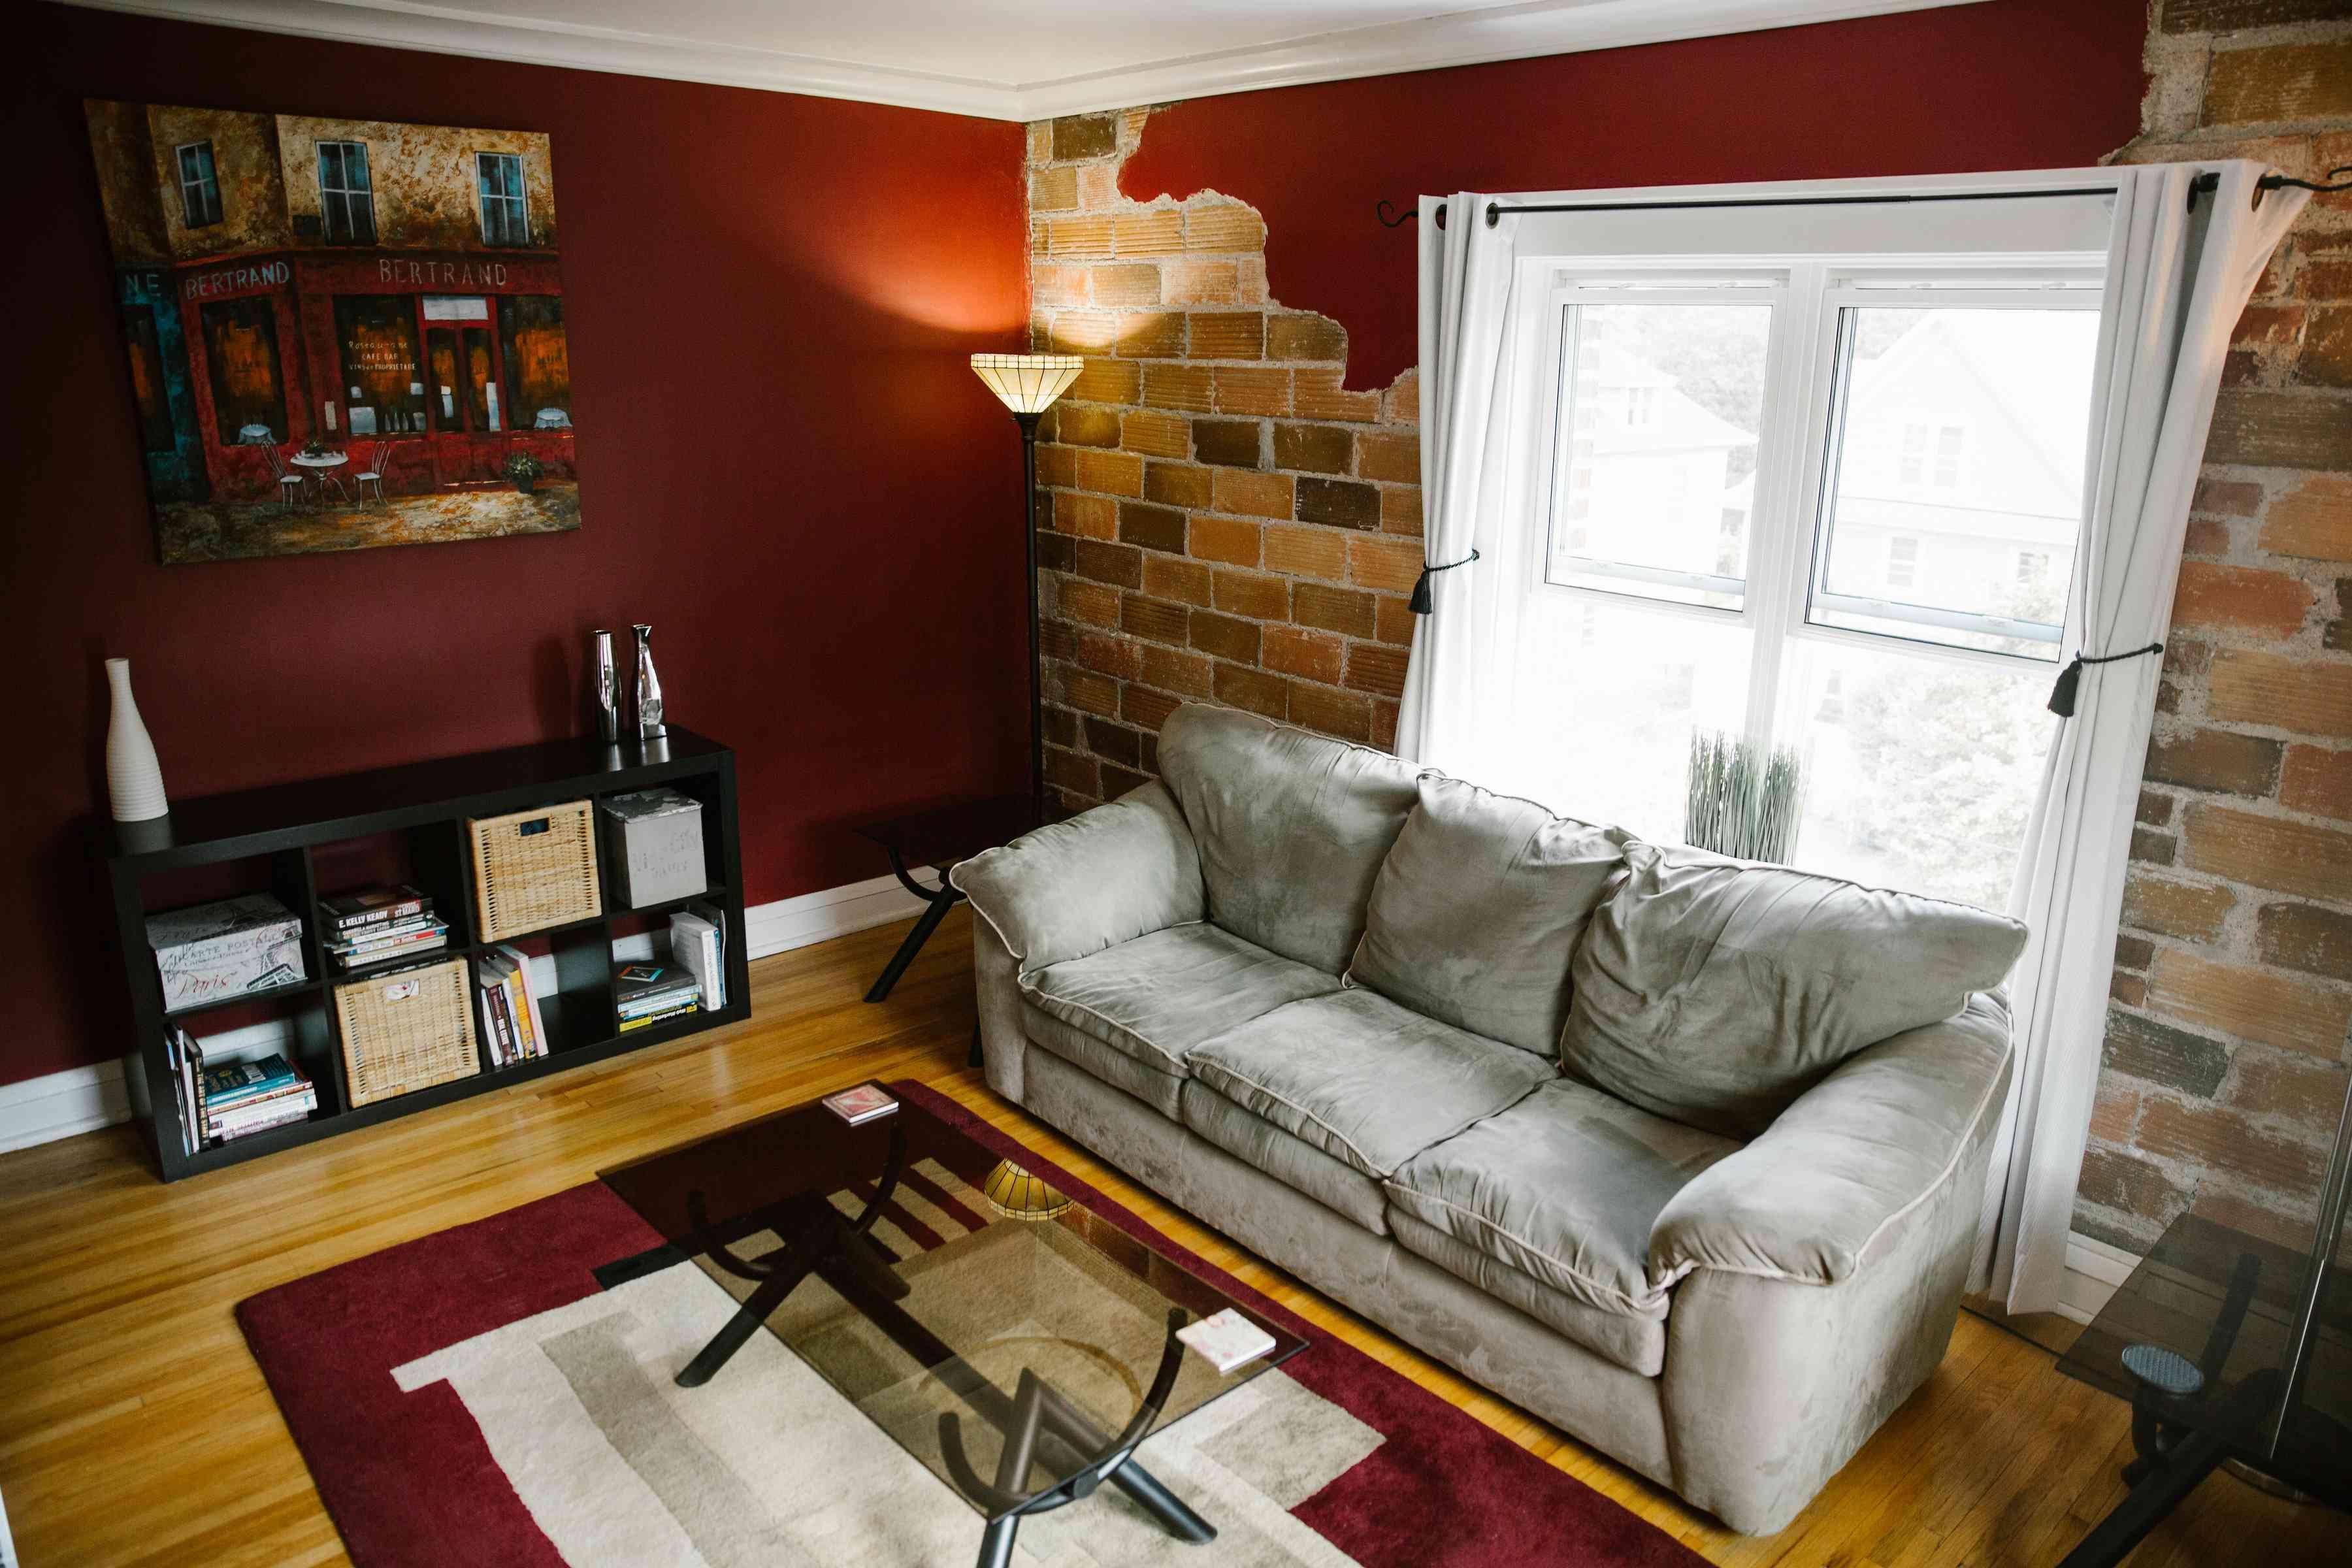 Apartment Condo Rental Minneapolis